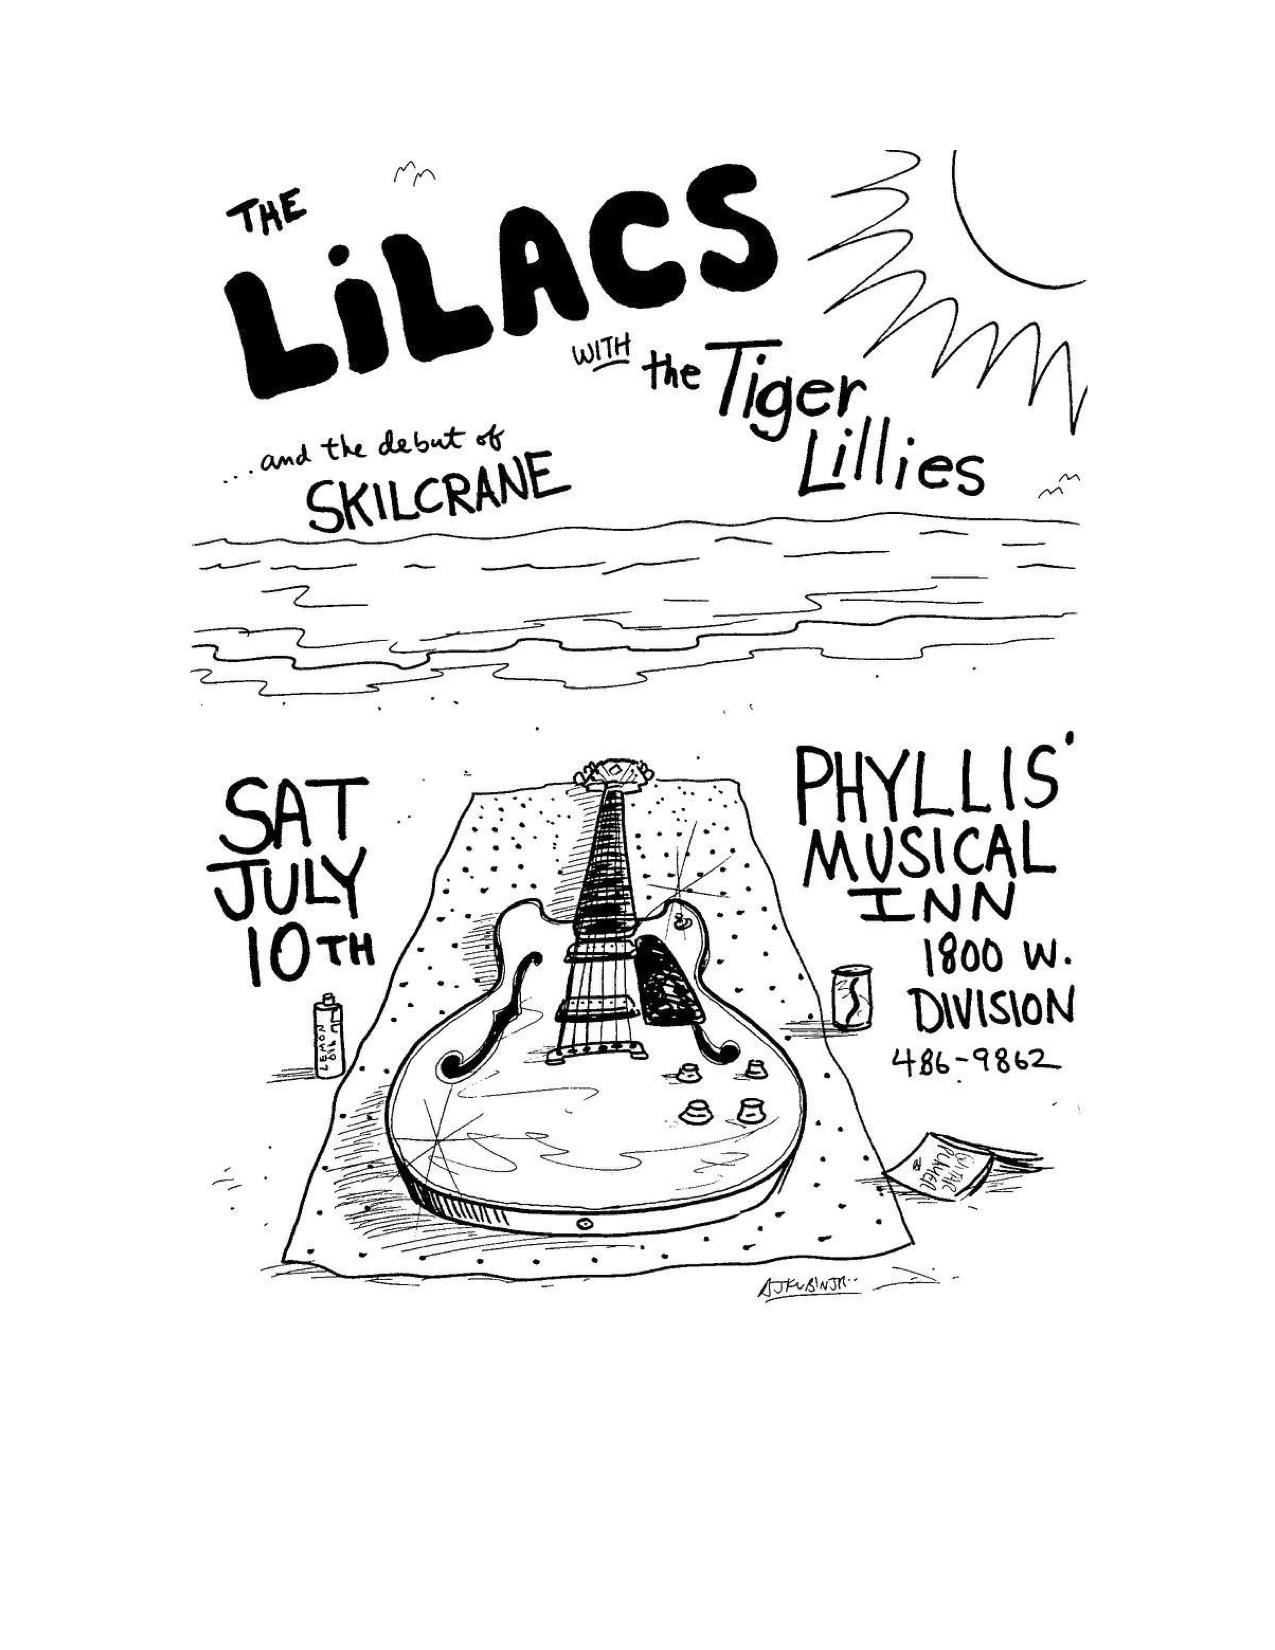 The Lilacs Poster 27 (Skilcrane, Tiger Lillies).jpg